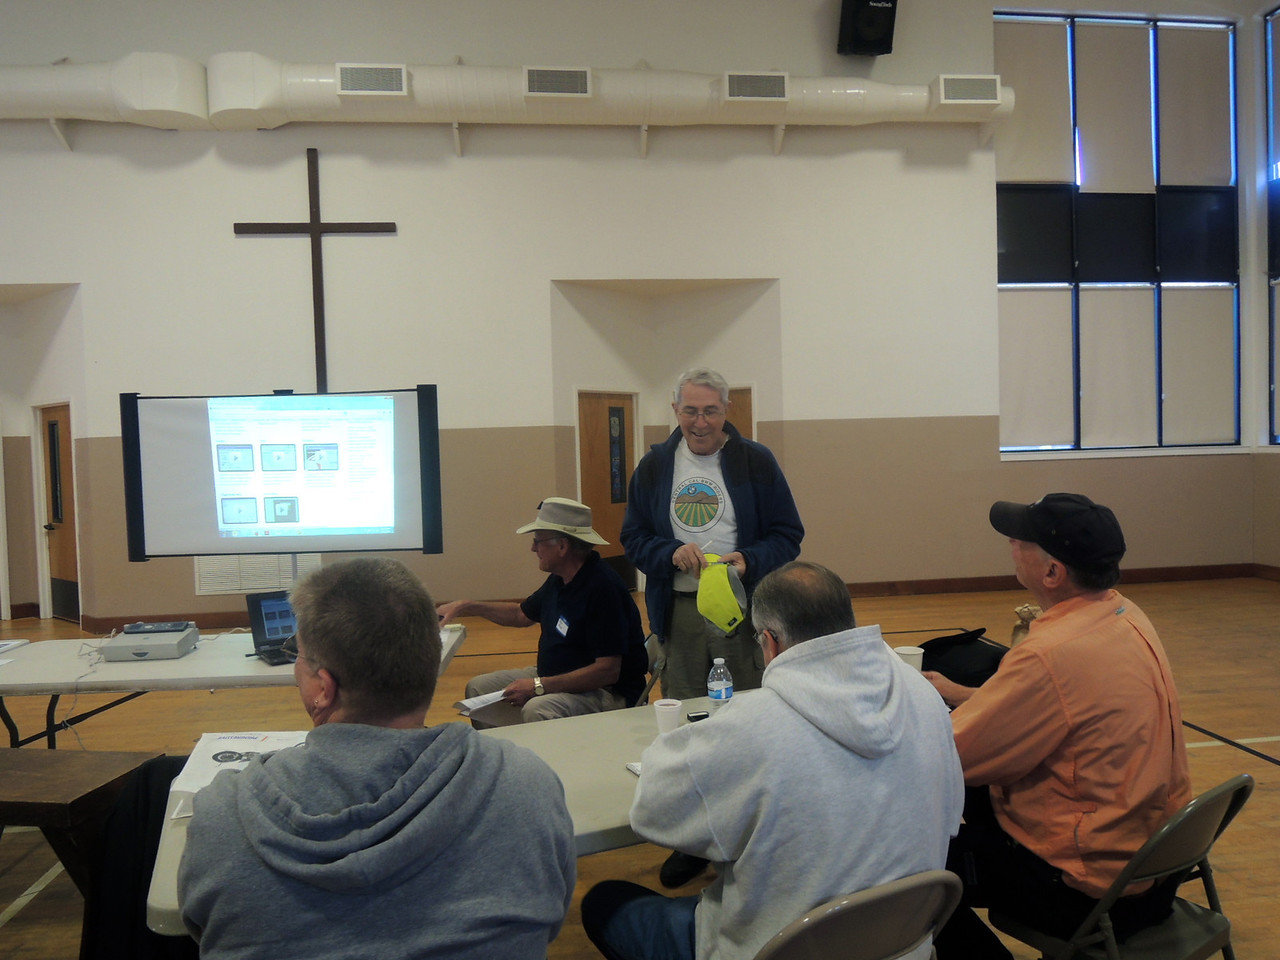 Bob Kuykendall welcomes seminar attendees